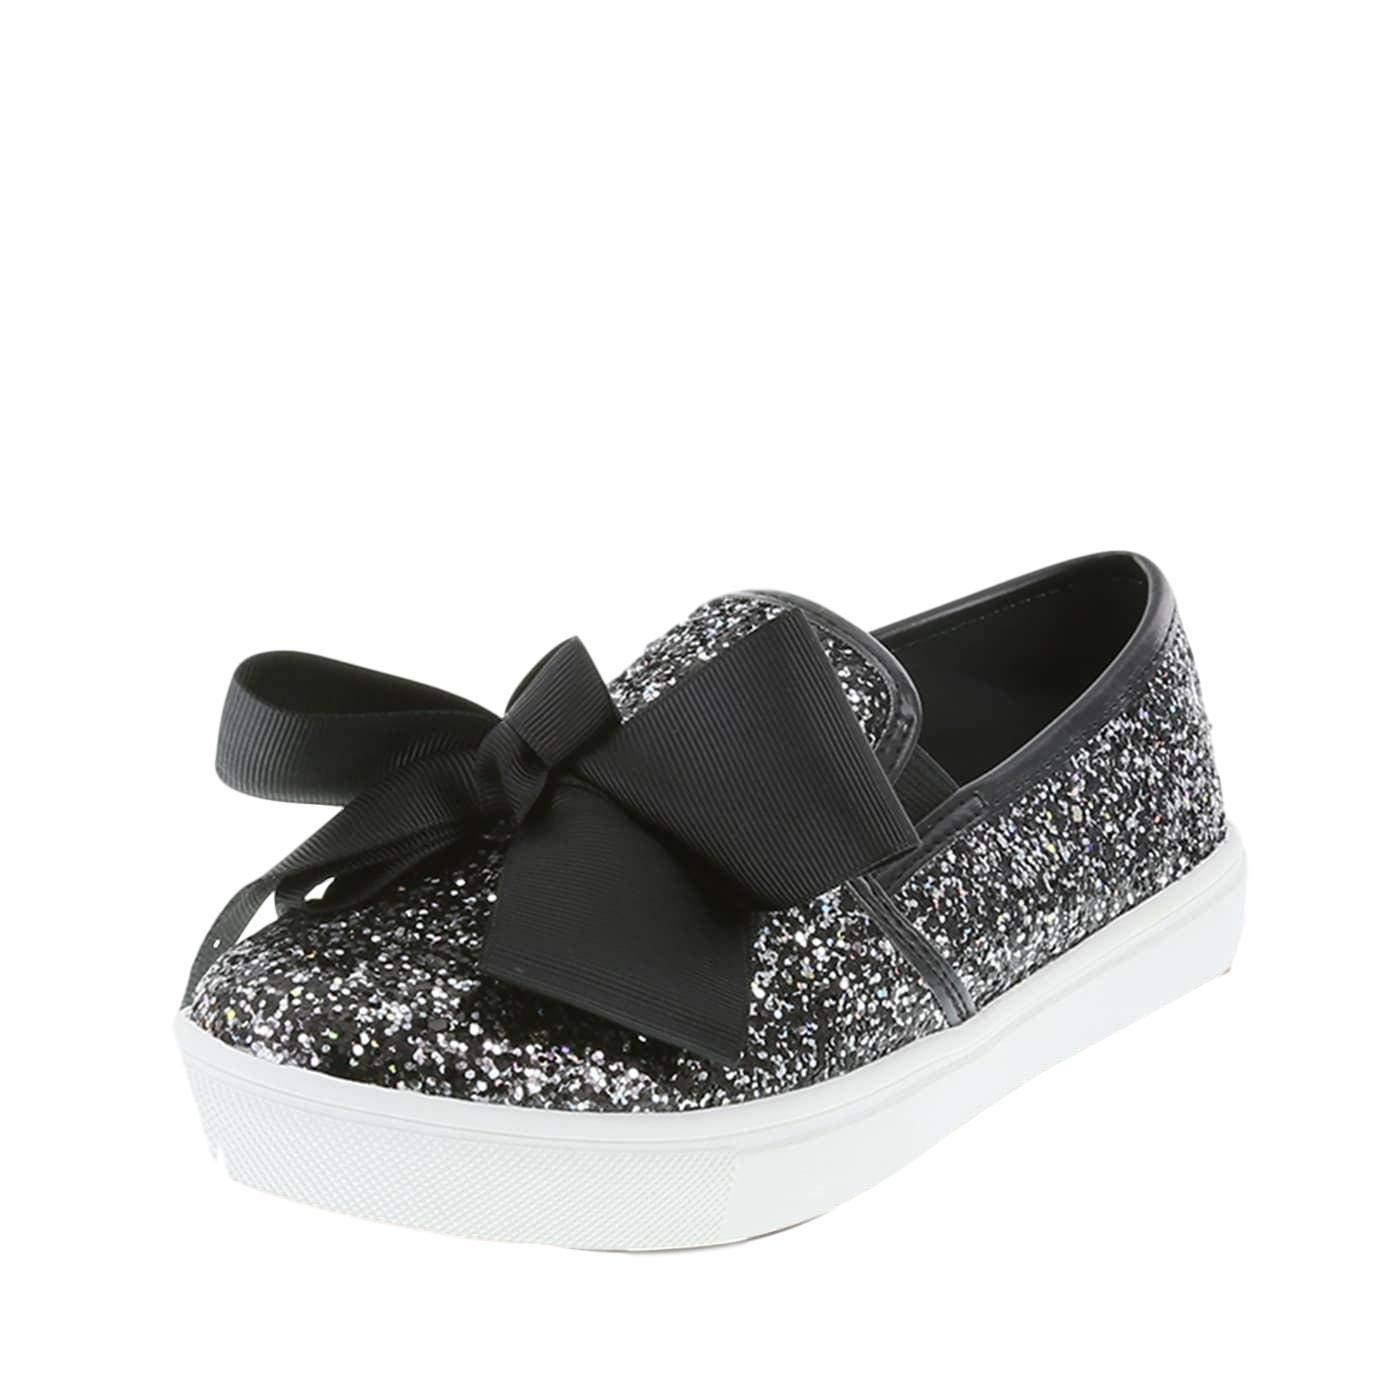 Nick Jr Girls JoJo Siwa Shoes Slip on